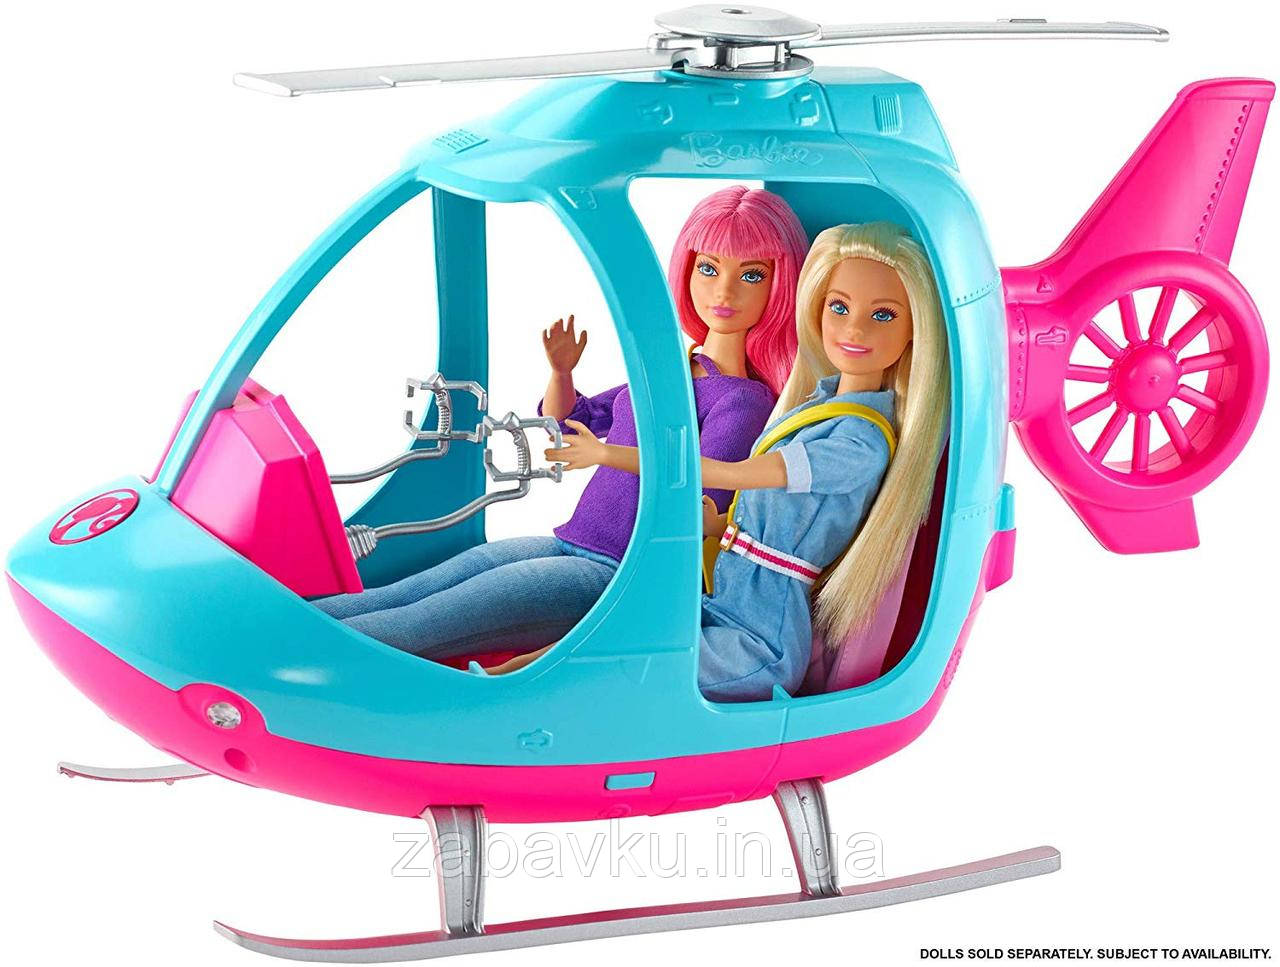 Вертолет для куклы Барби Barbie Travel Helicopter Вертоліт Барбі оригінал